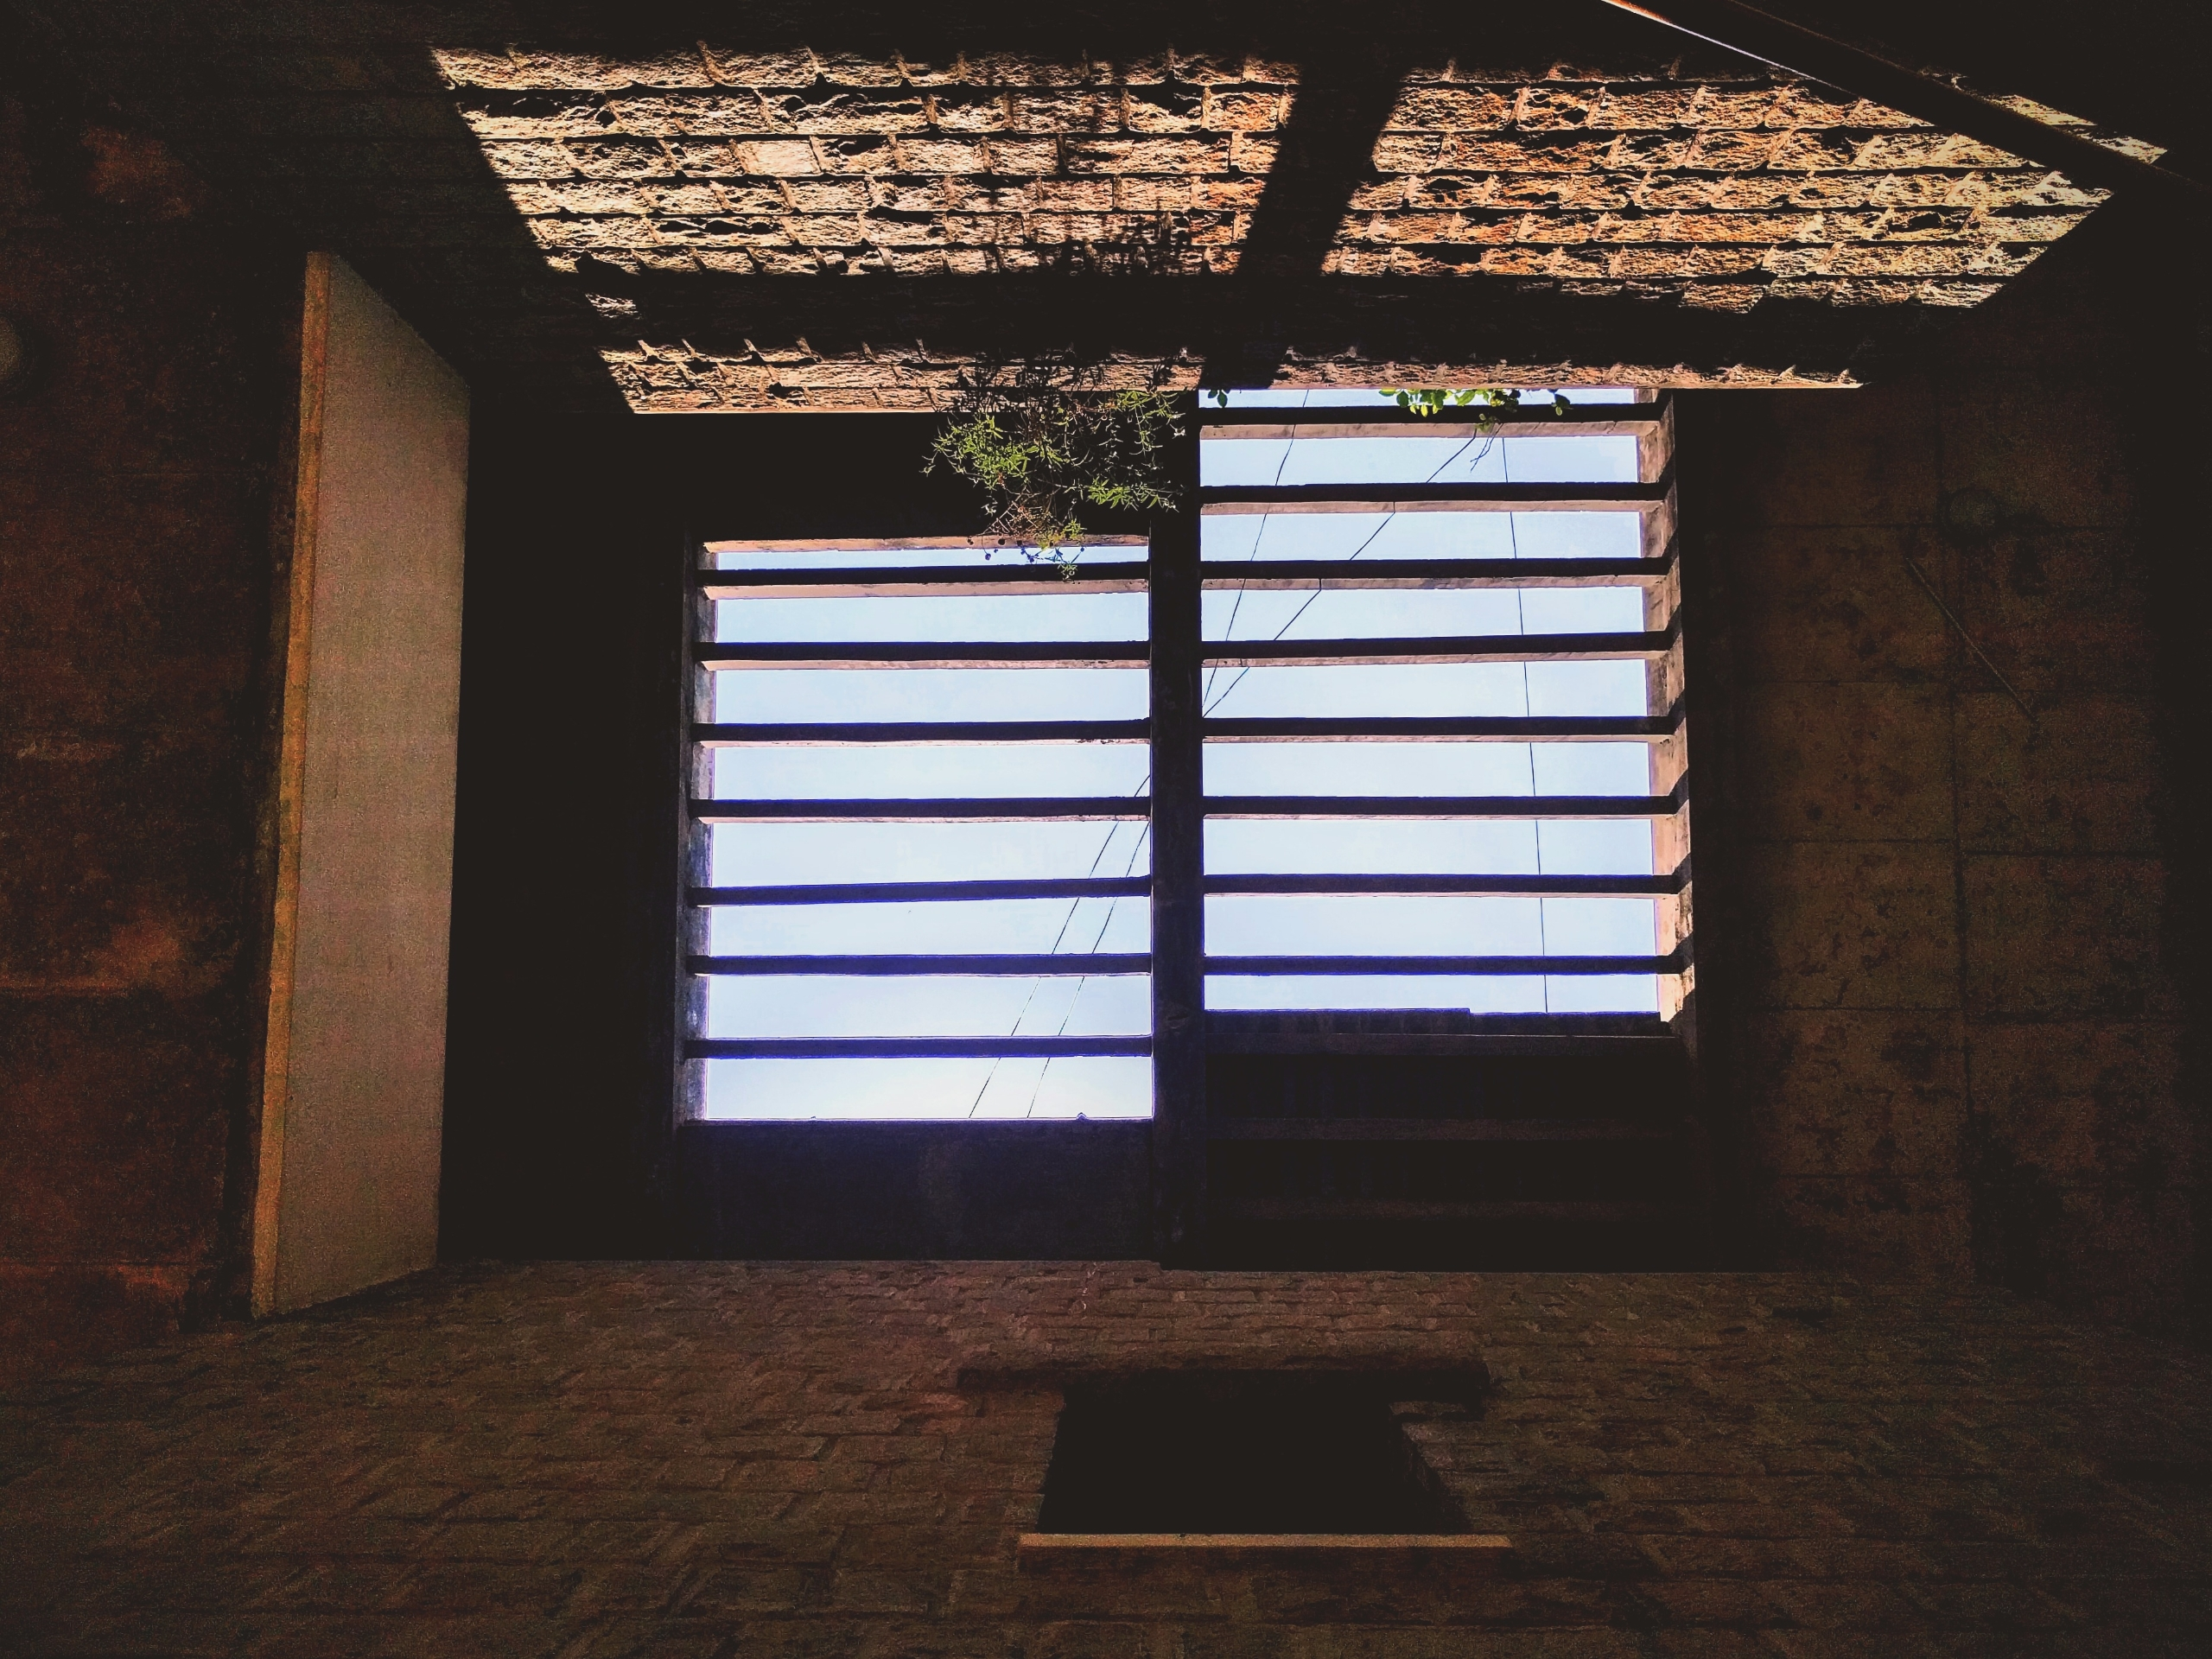   LIT skylight irradiates space - ishwarasandeshcm   ello